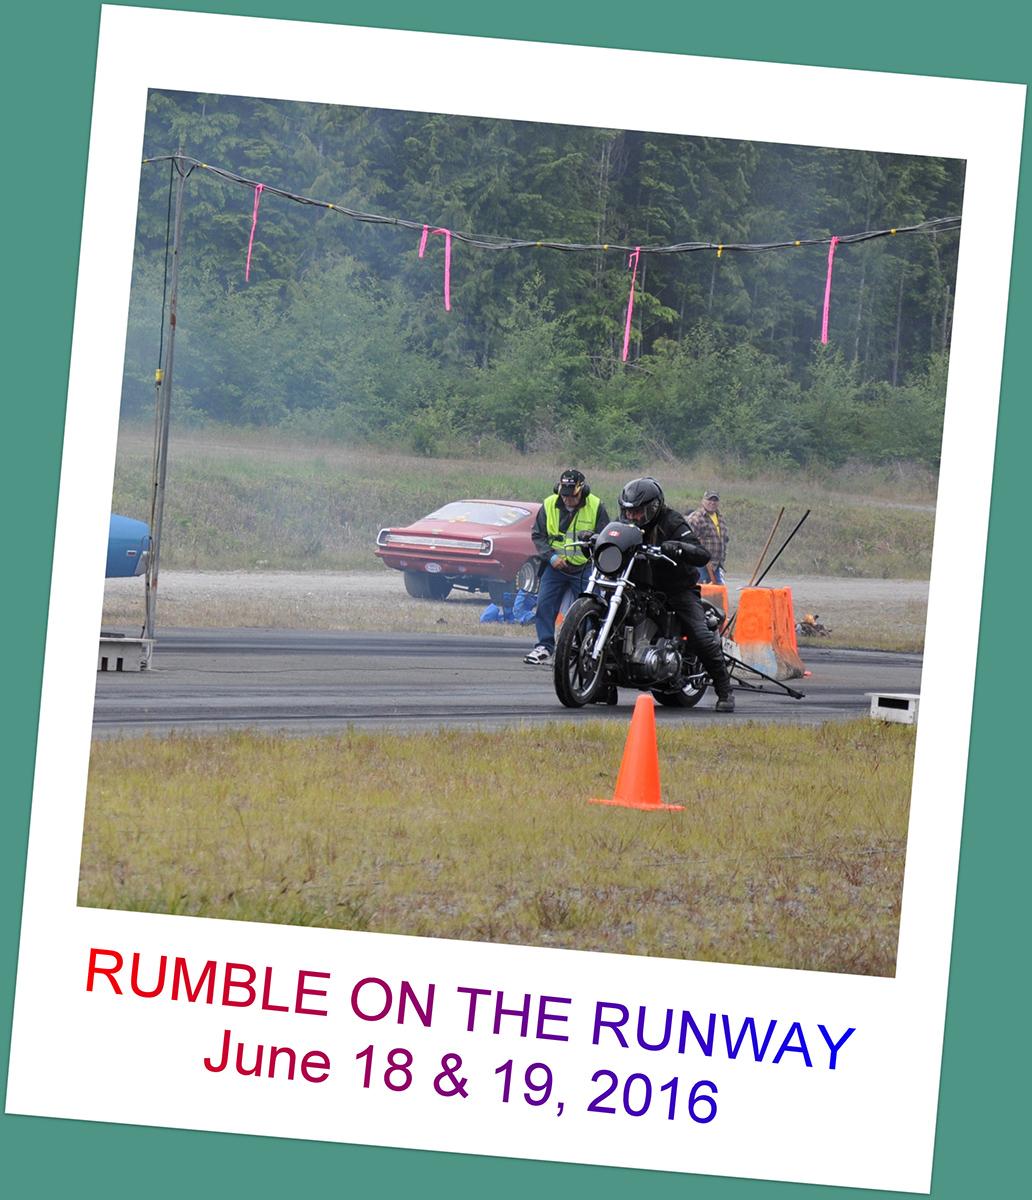 Rumble on the Runway June 18 & 19, 2016 1127